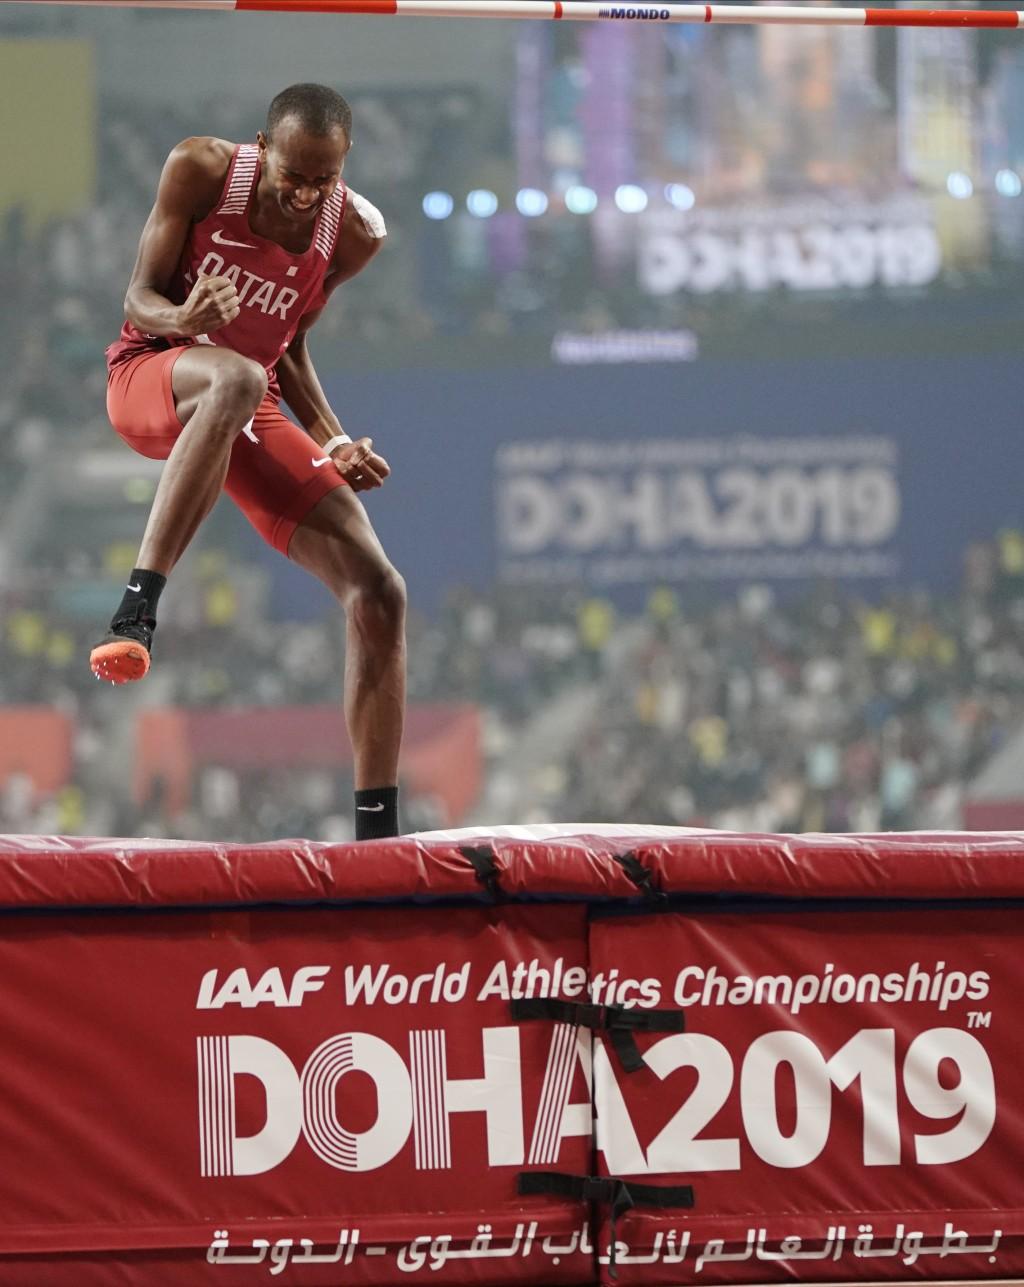 Gold medalist Mutaz Essa Barshim, of Qatar, celebrates after the men's high jump final at the World Athletics Championships in Doha, Qatar, Friday, Oc...